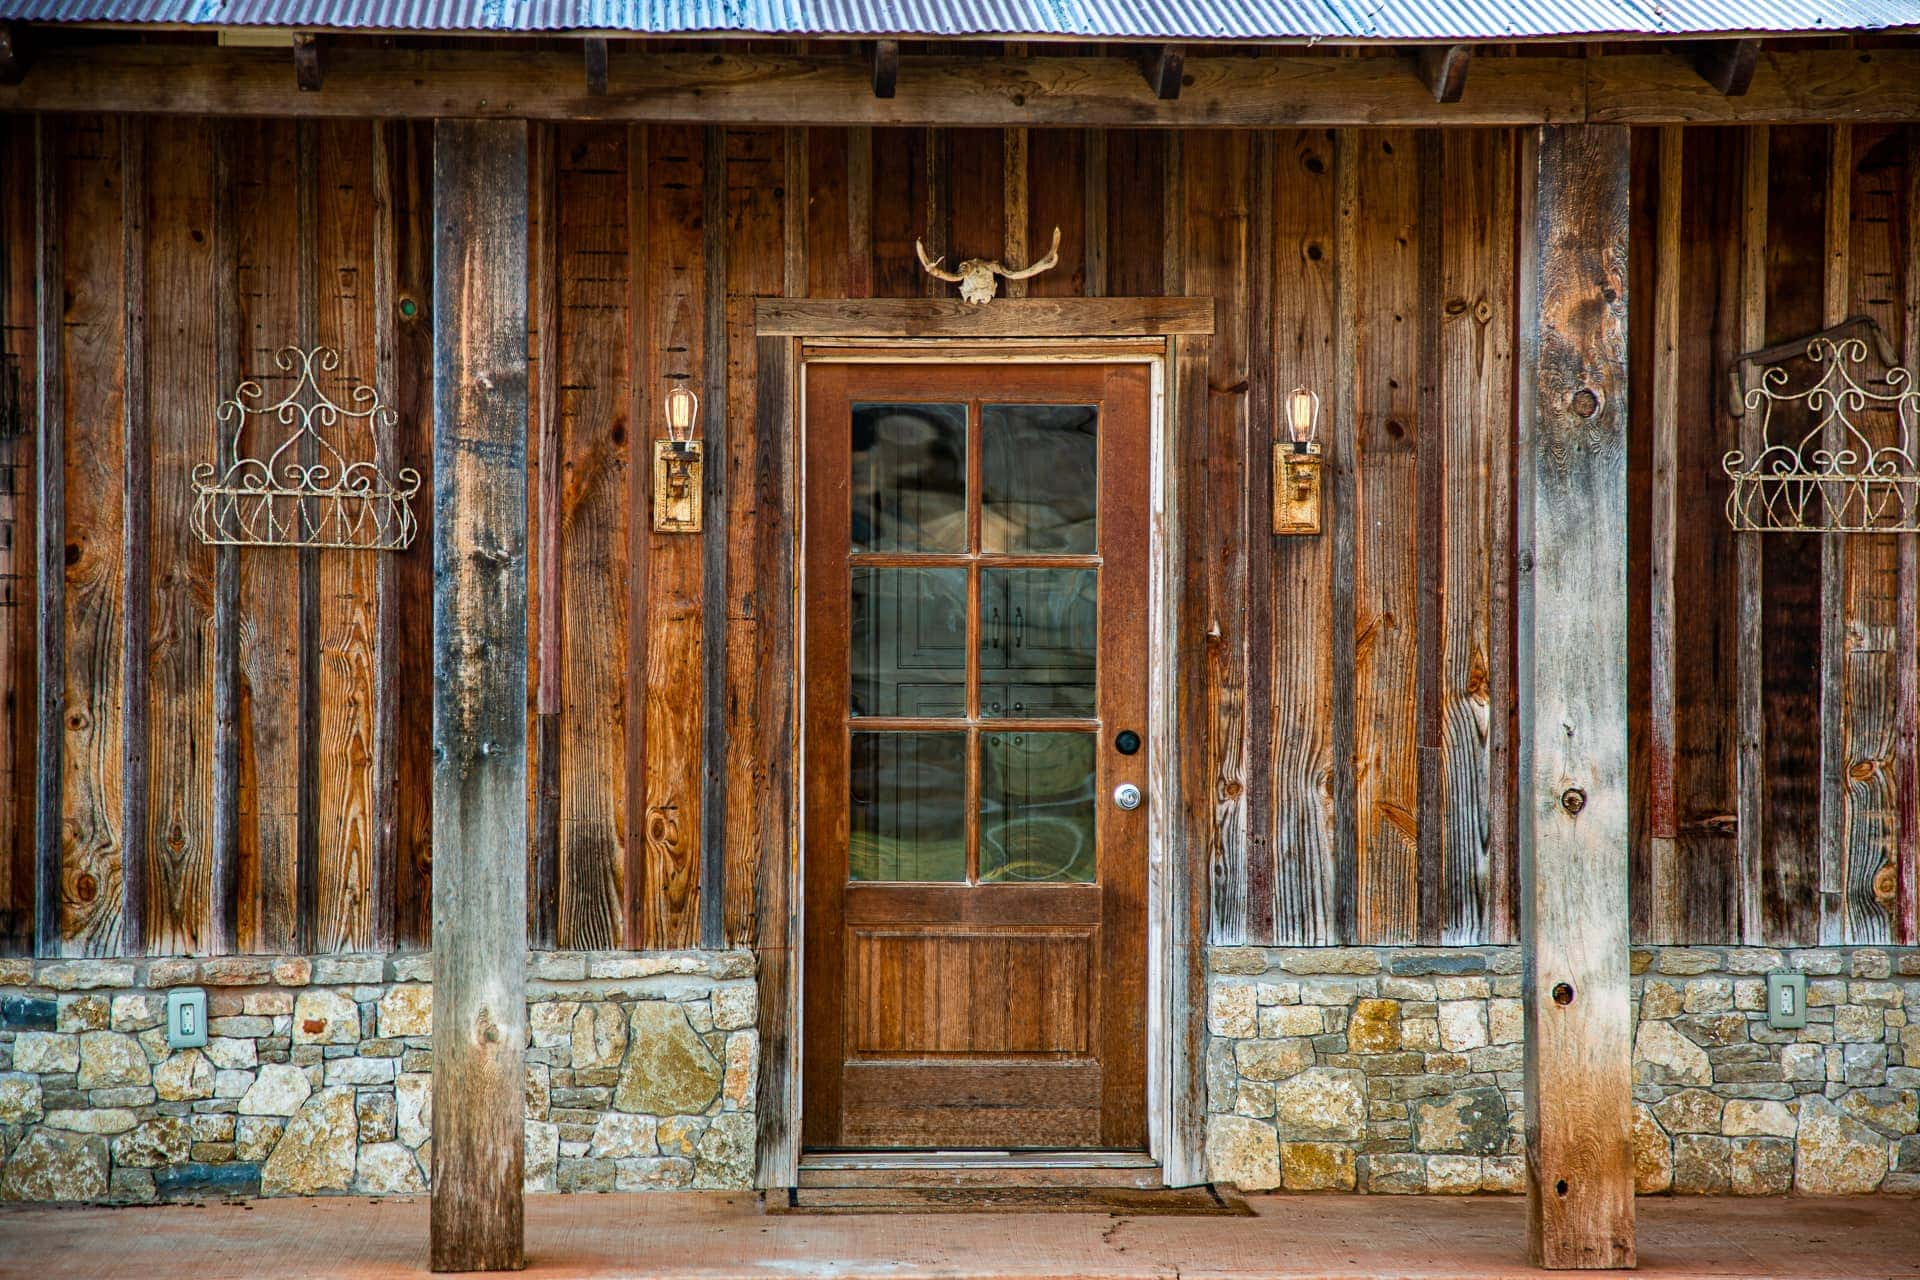 Beautiful Details in the Barn at Esperanza Ranch